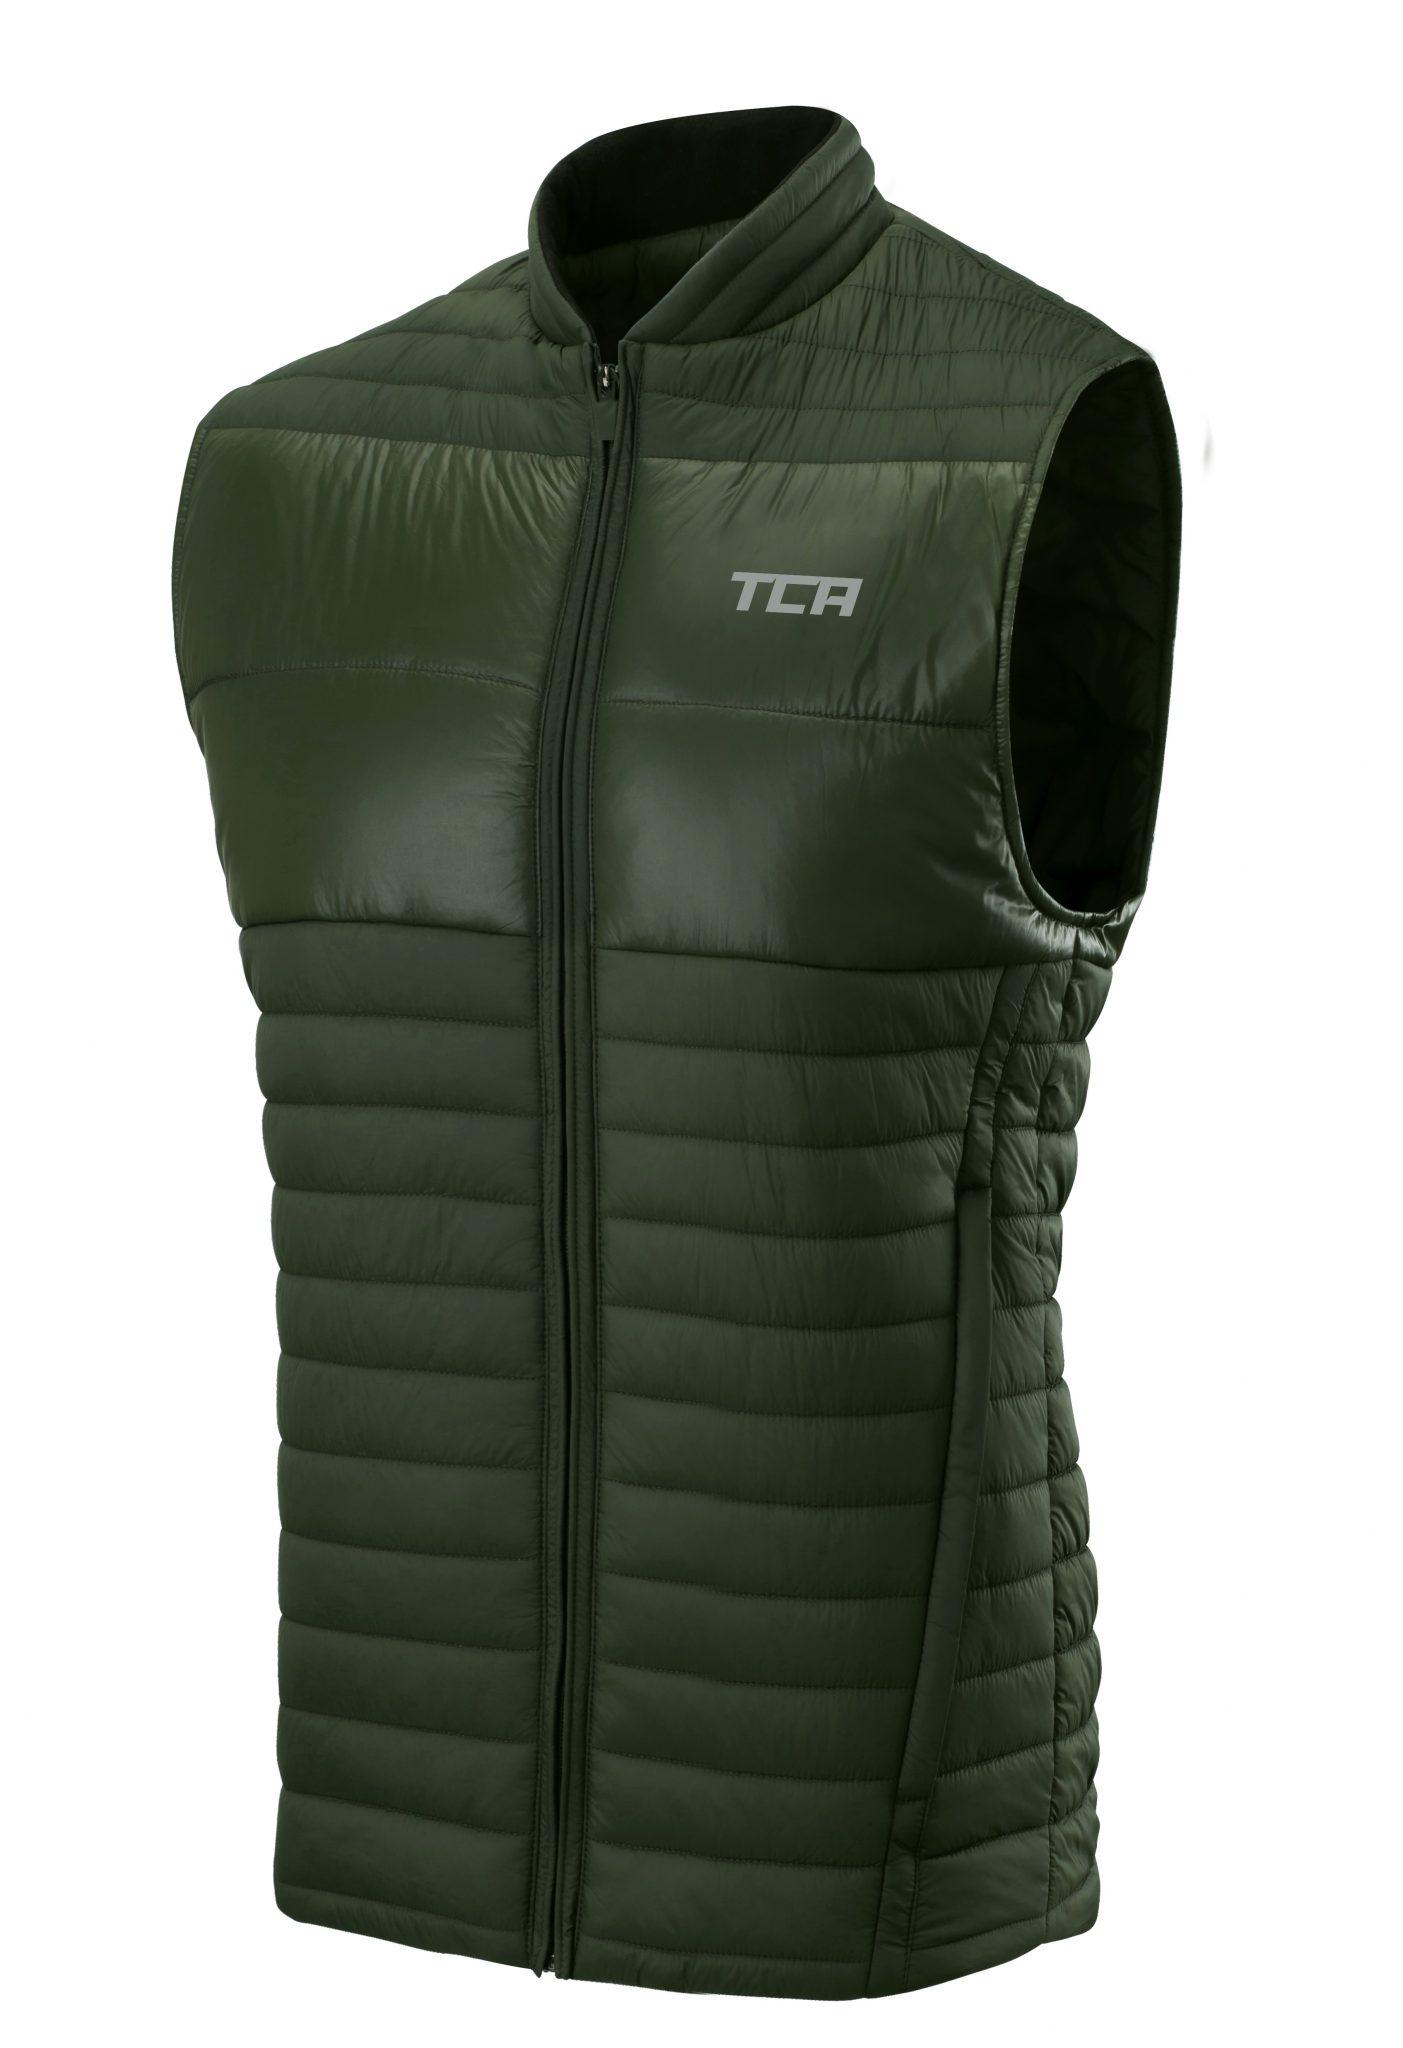 Combat Gilet - Deep Forest - £38 - TCA